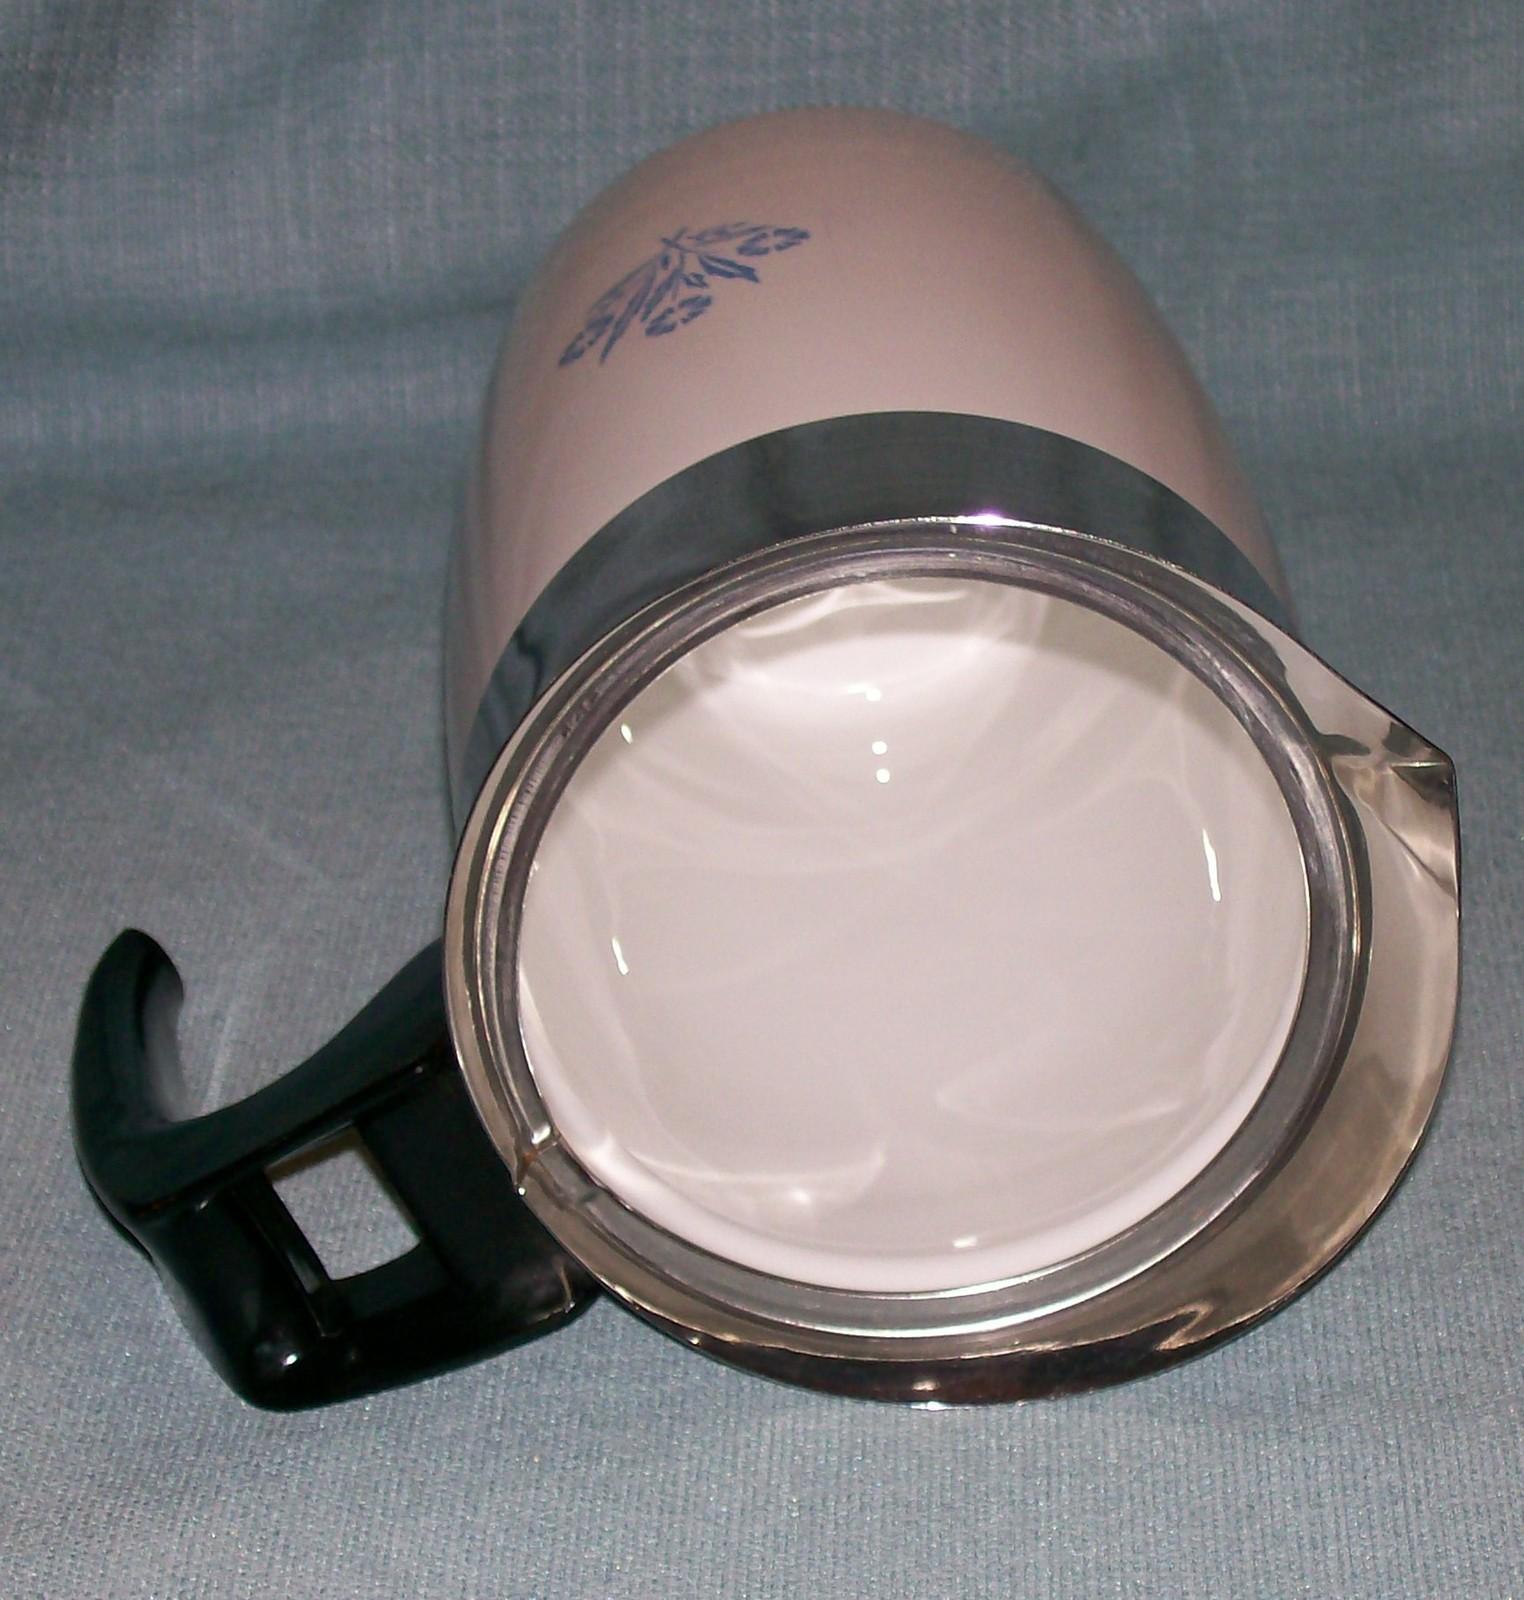 Corning Ware BLUE CORNFLOWER Electric Coffee Pot/Percolator 6 cup P-6-EP VGVC  image 7